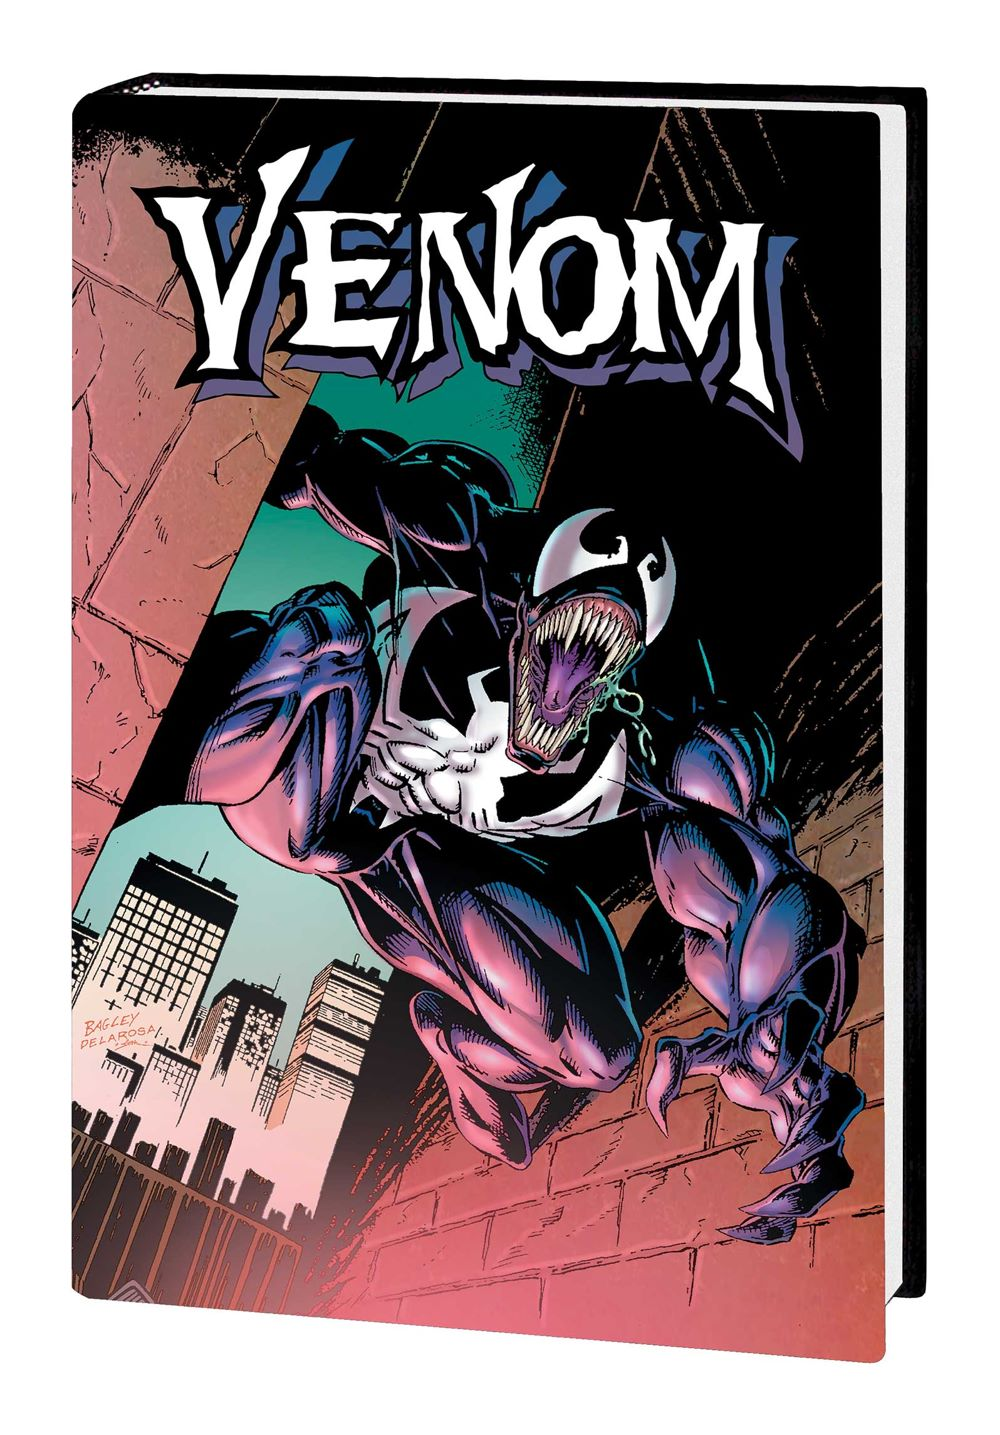 VENOM_OMNIBUS_V1_HC Marvel Comics January 2021 Solicitations